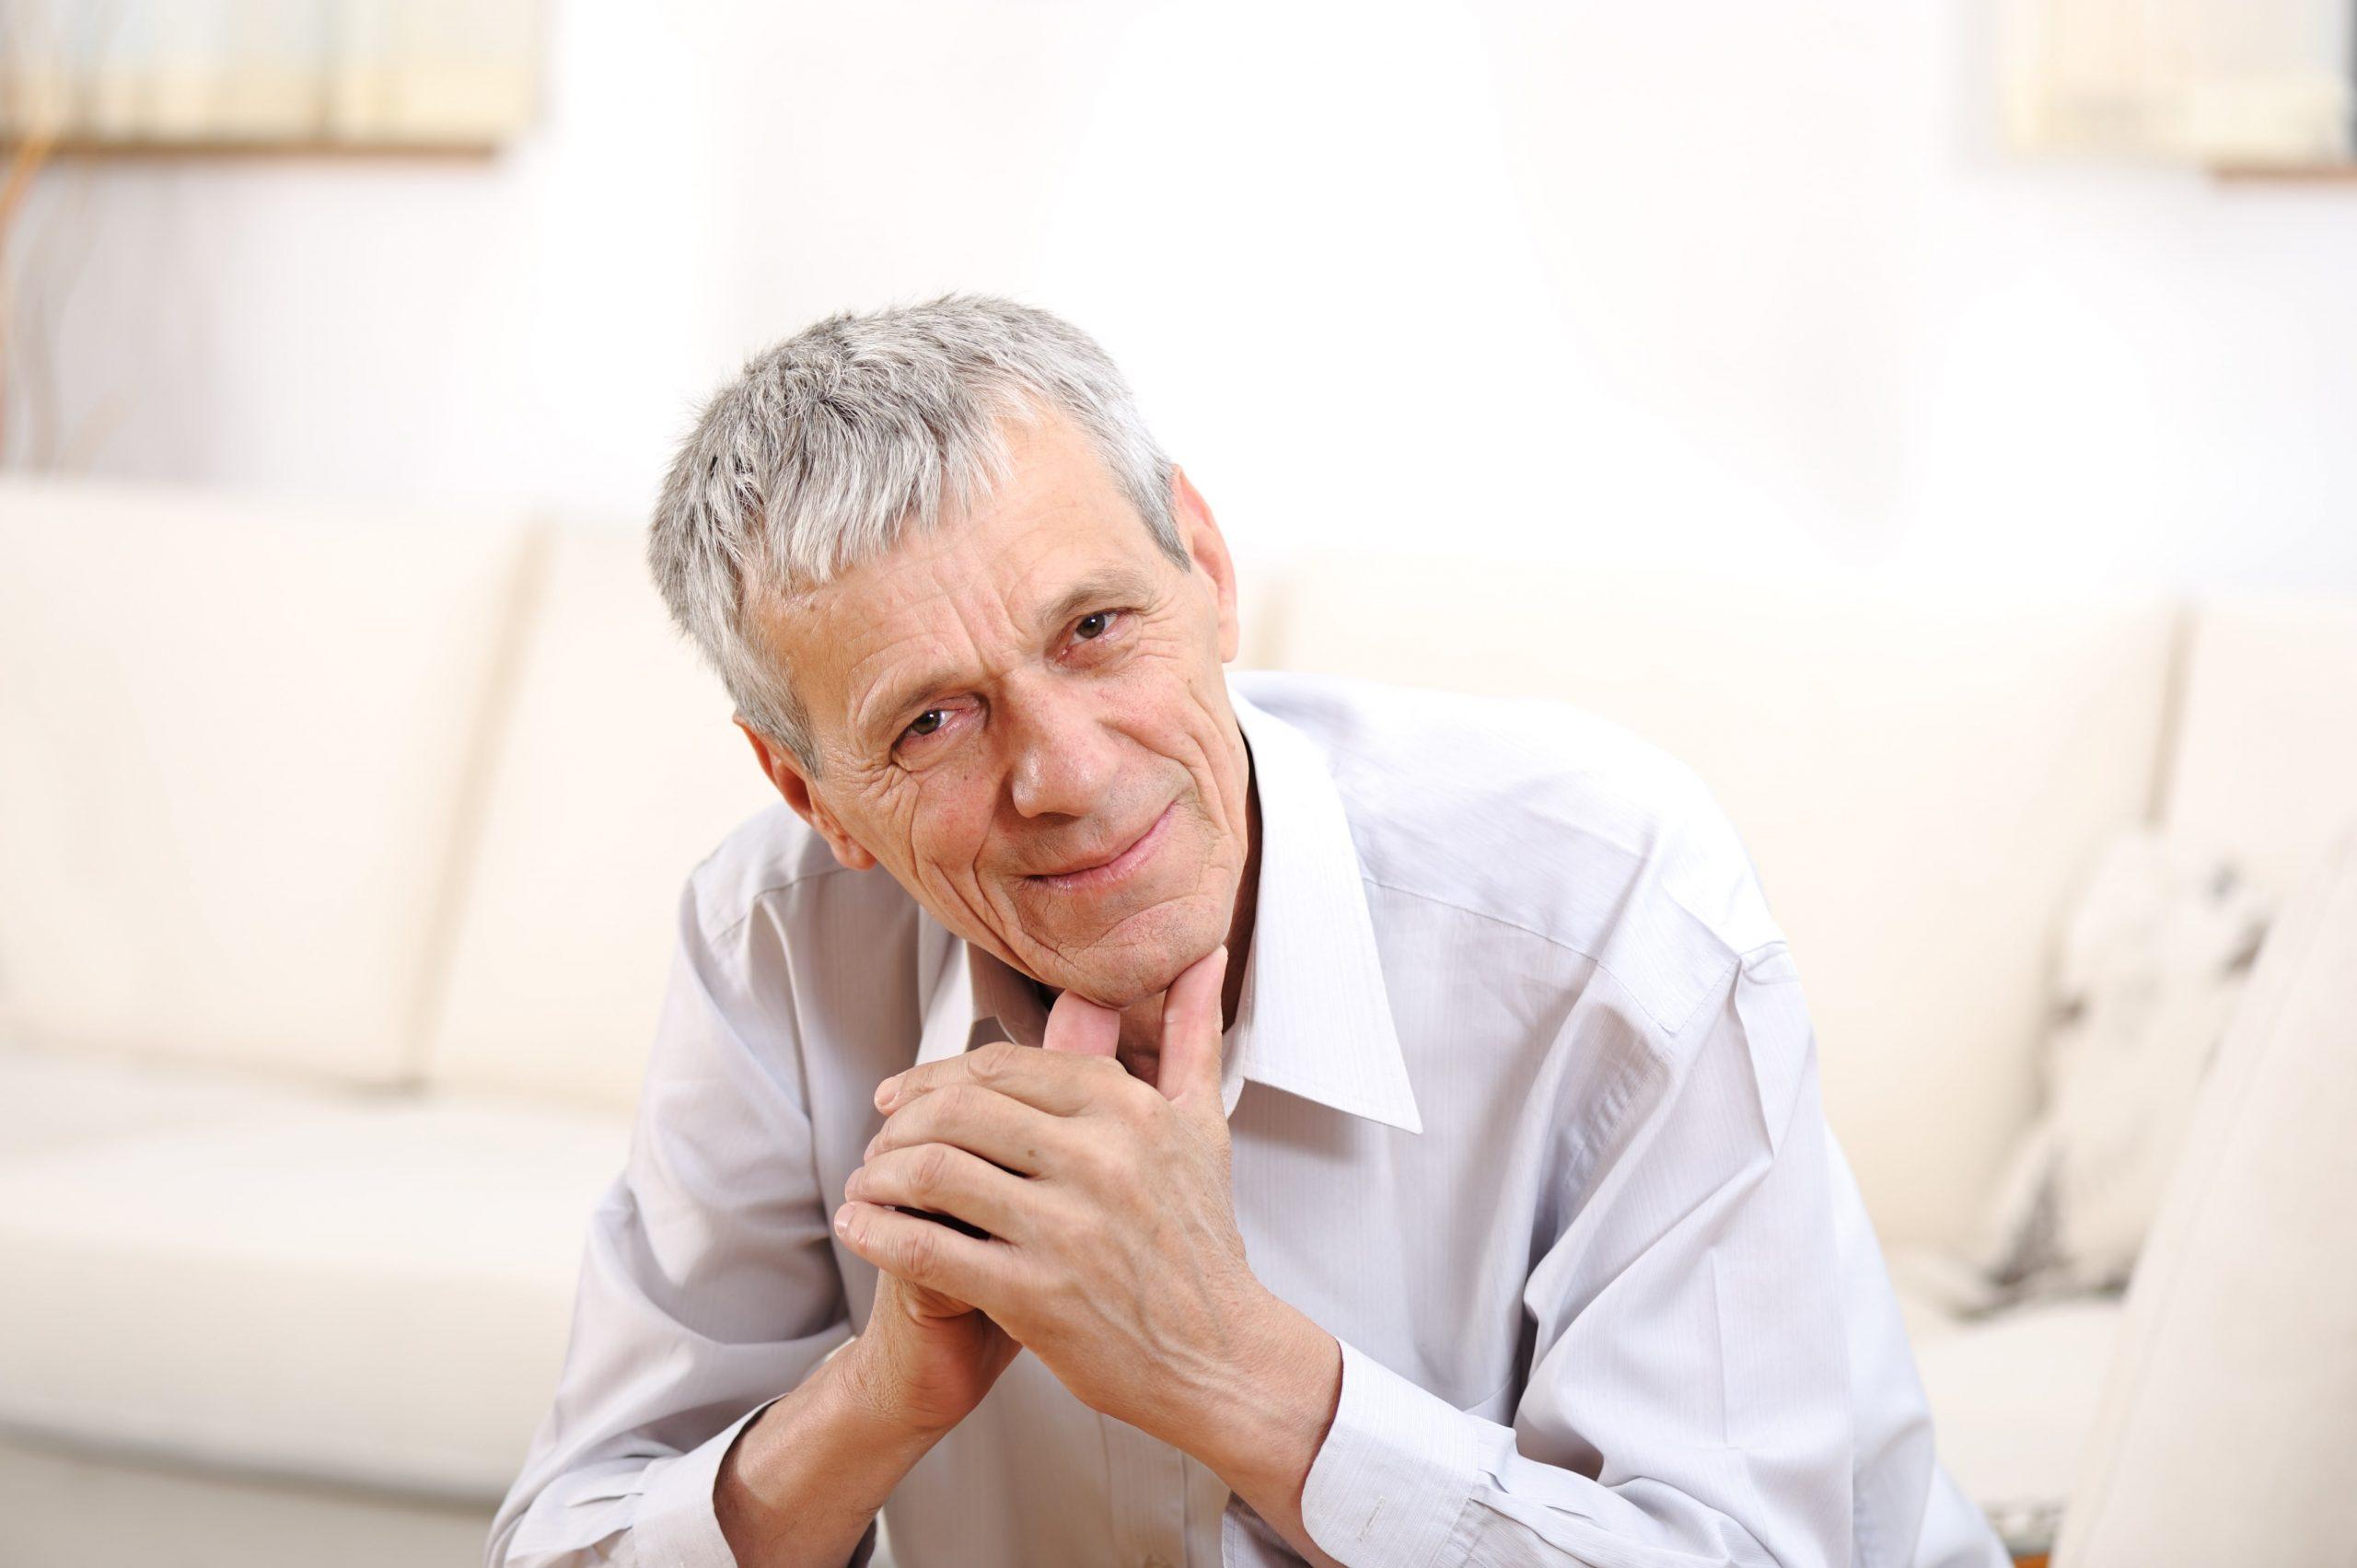 happy-relaxed-elderly-man-on-sofa